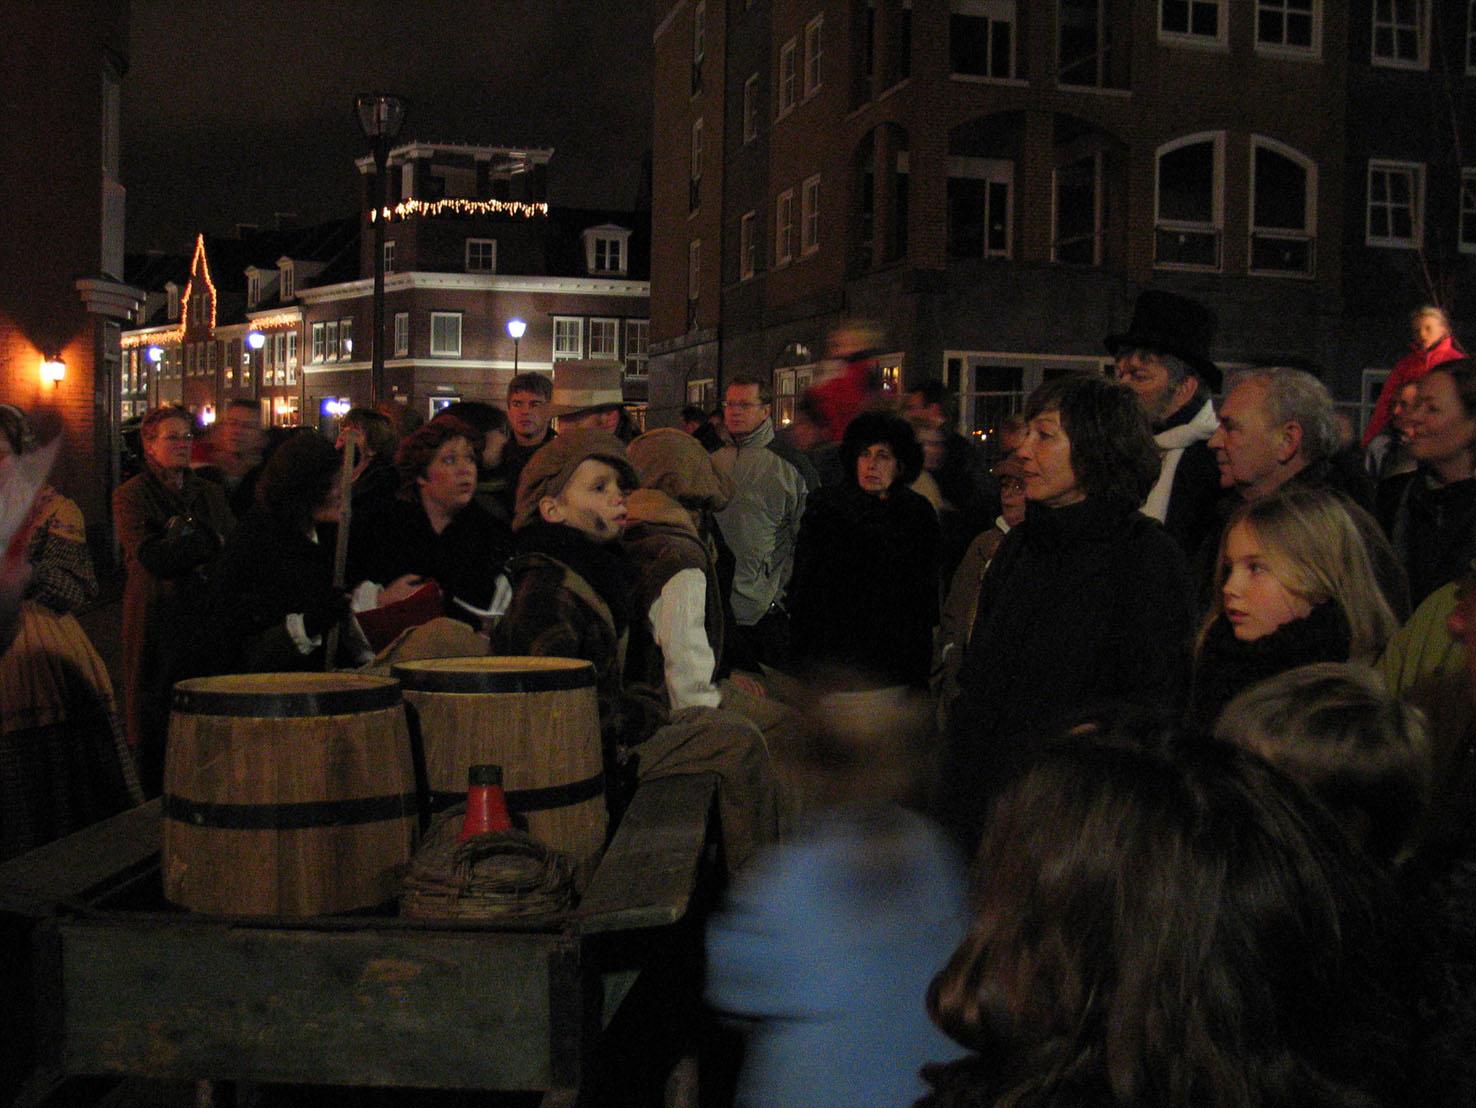 092 - Kerstmarkt Helmond 2003.jpg